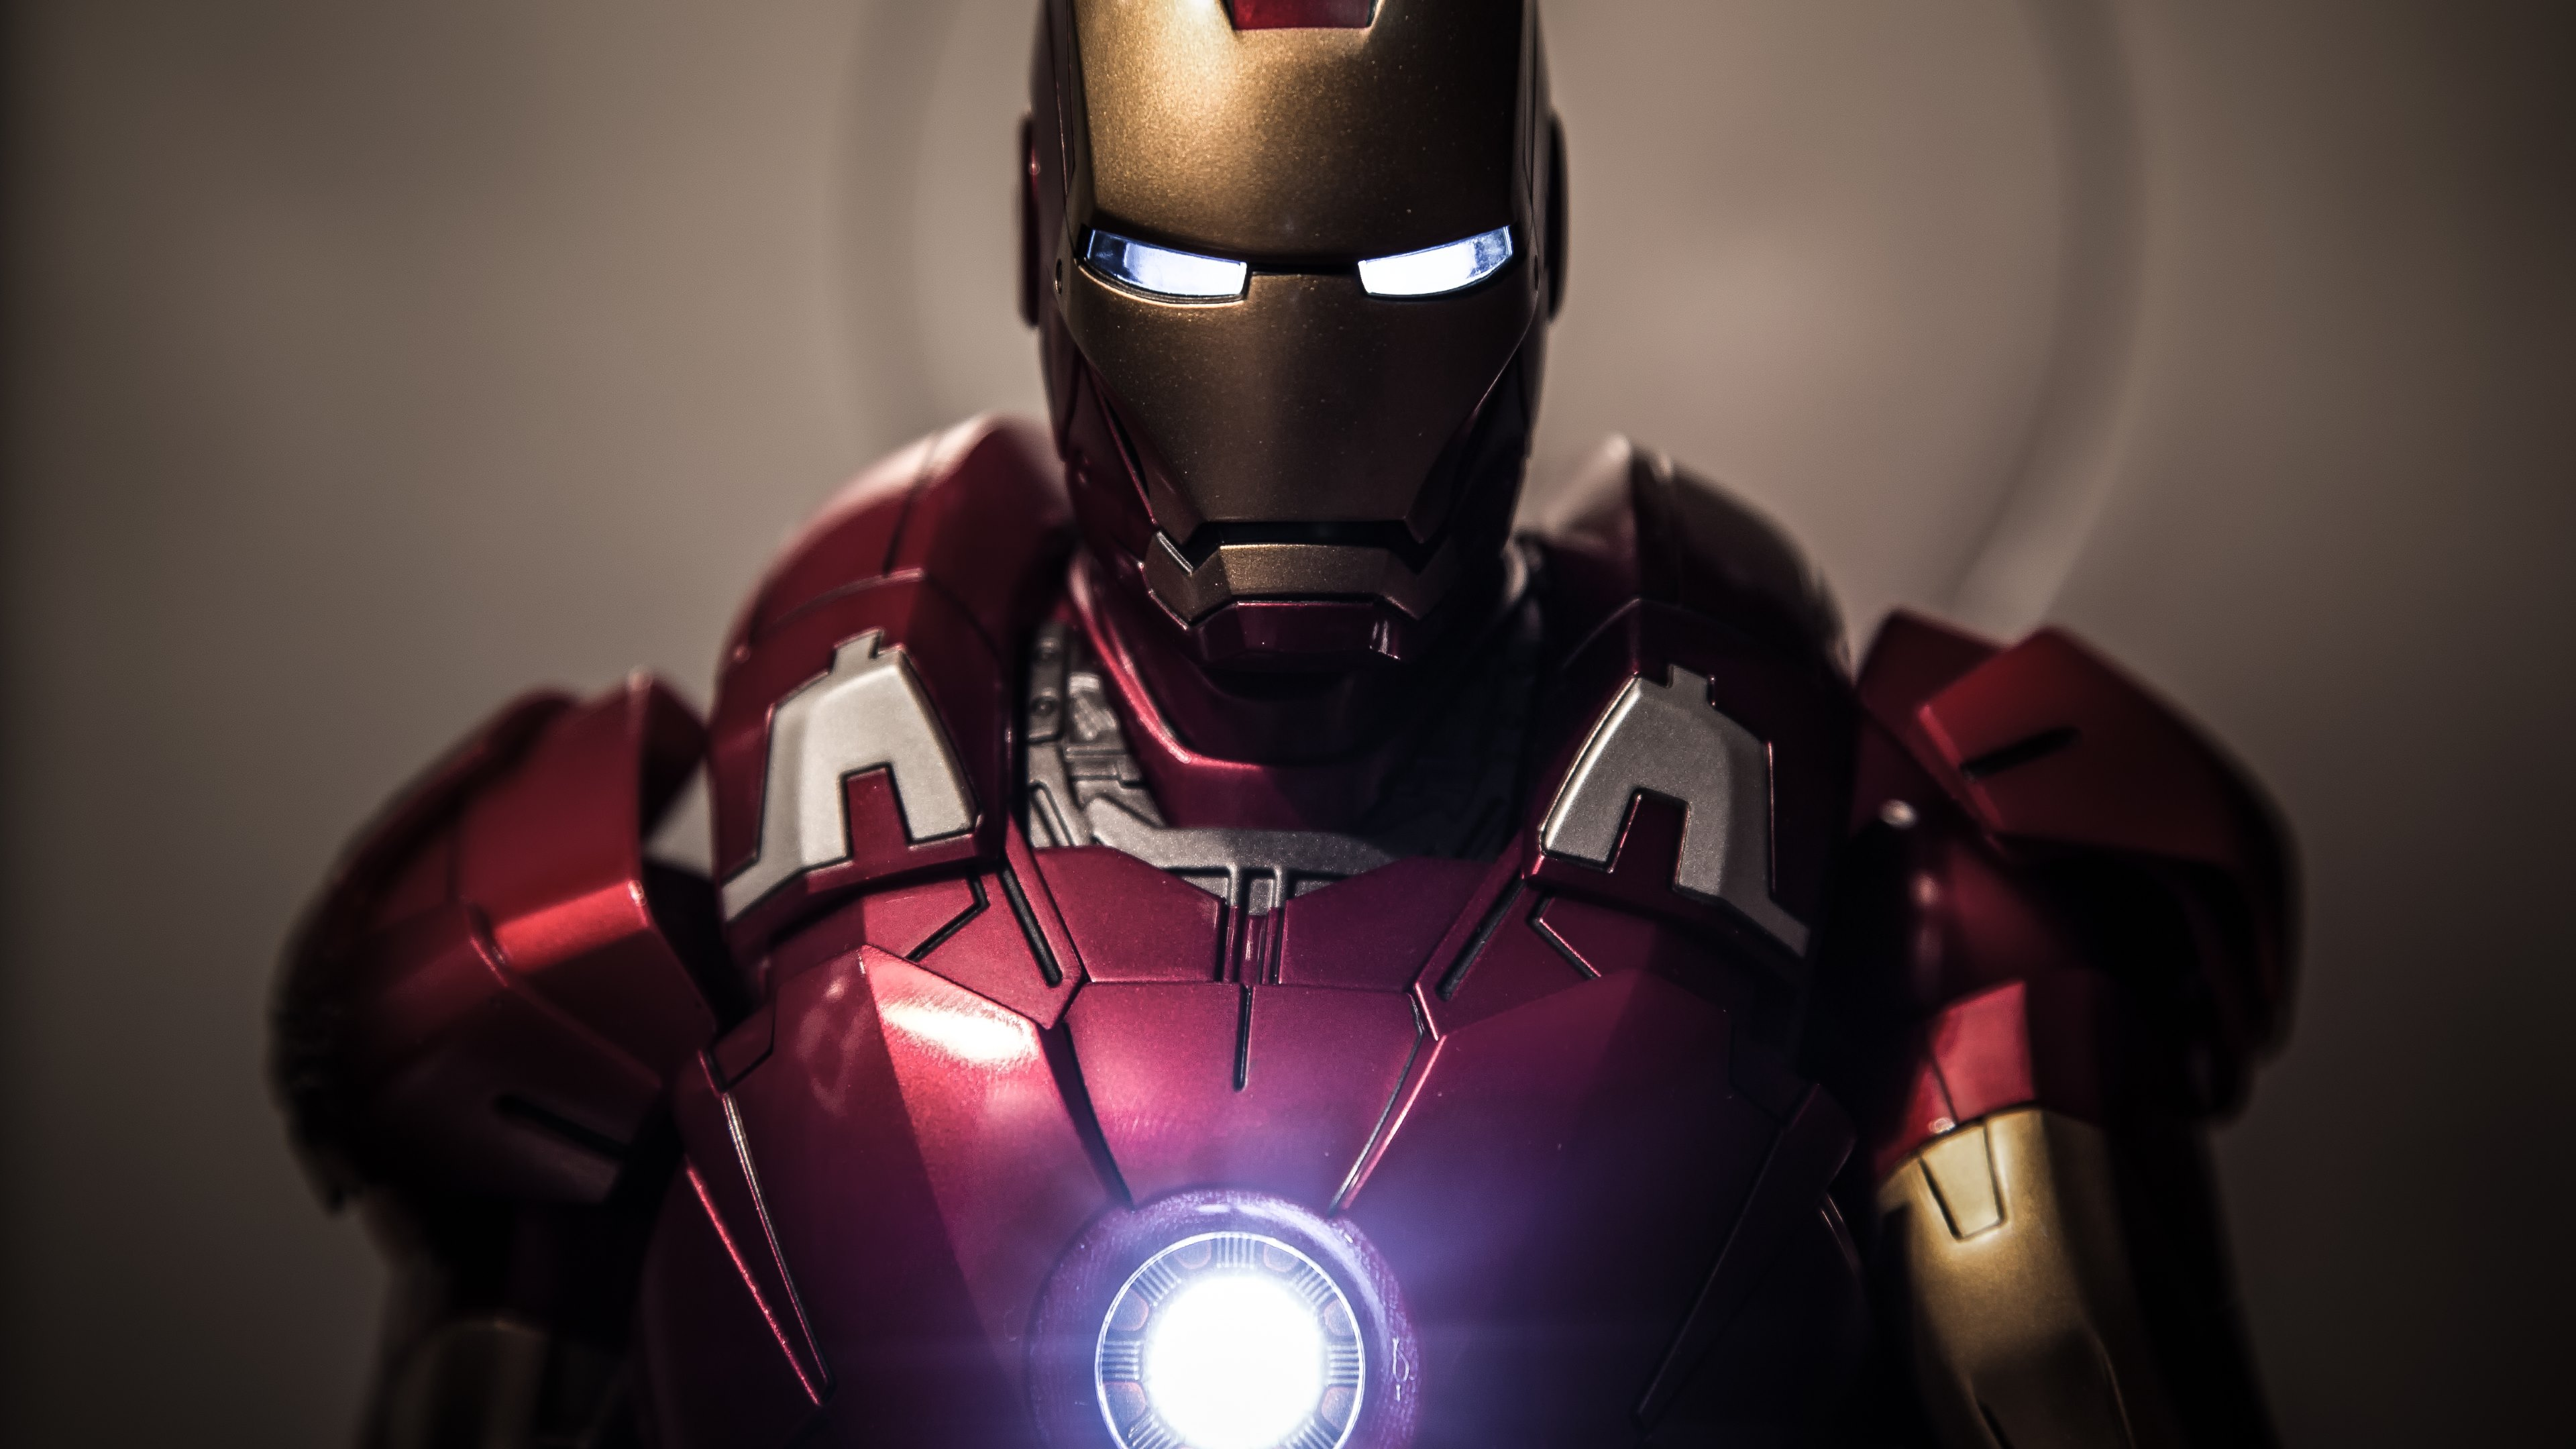 Iron Man Wolverine Captain America Hulk HD Wallpapers 4K 3840x2160